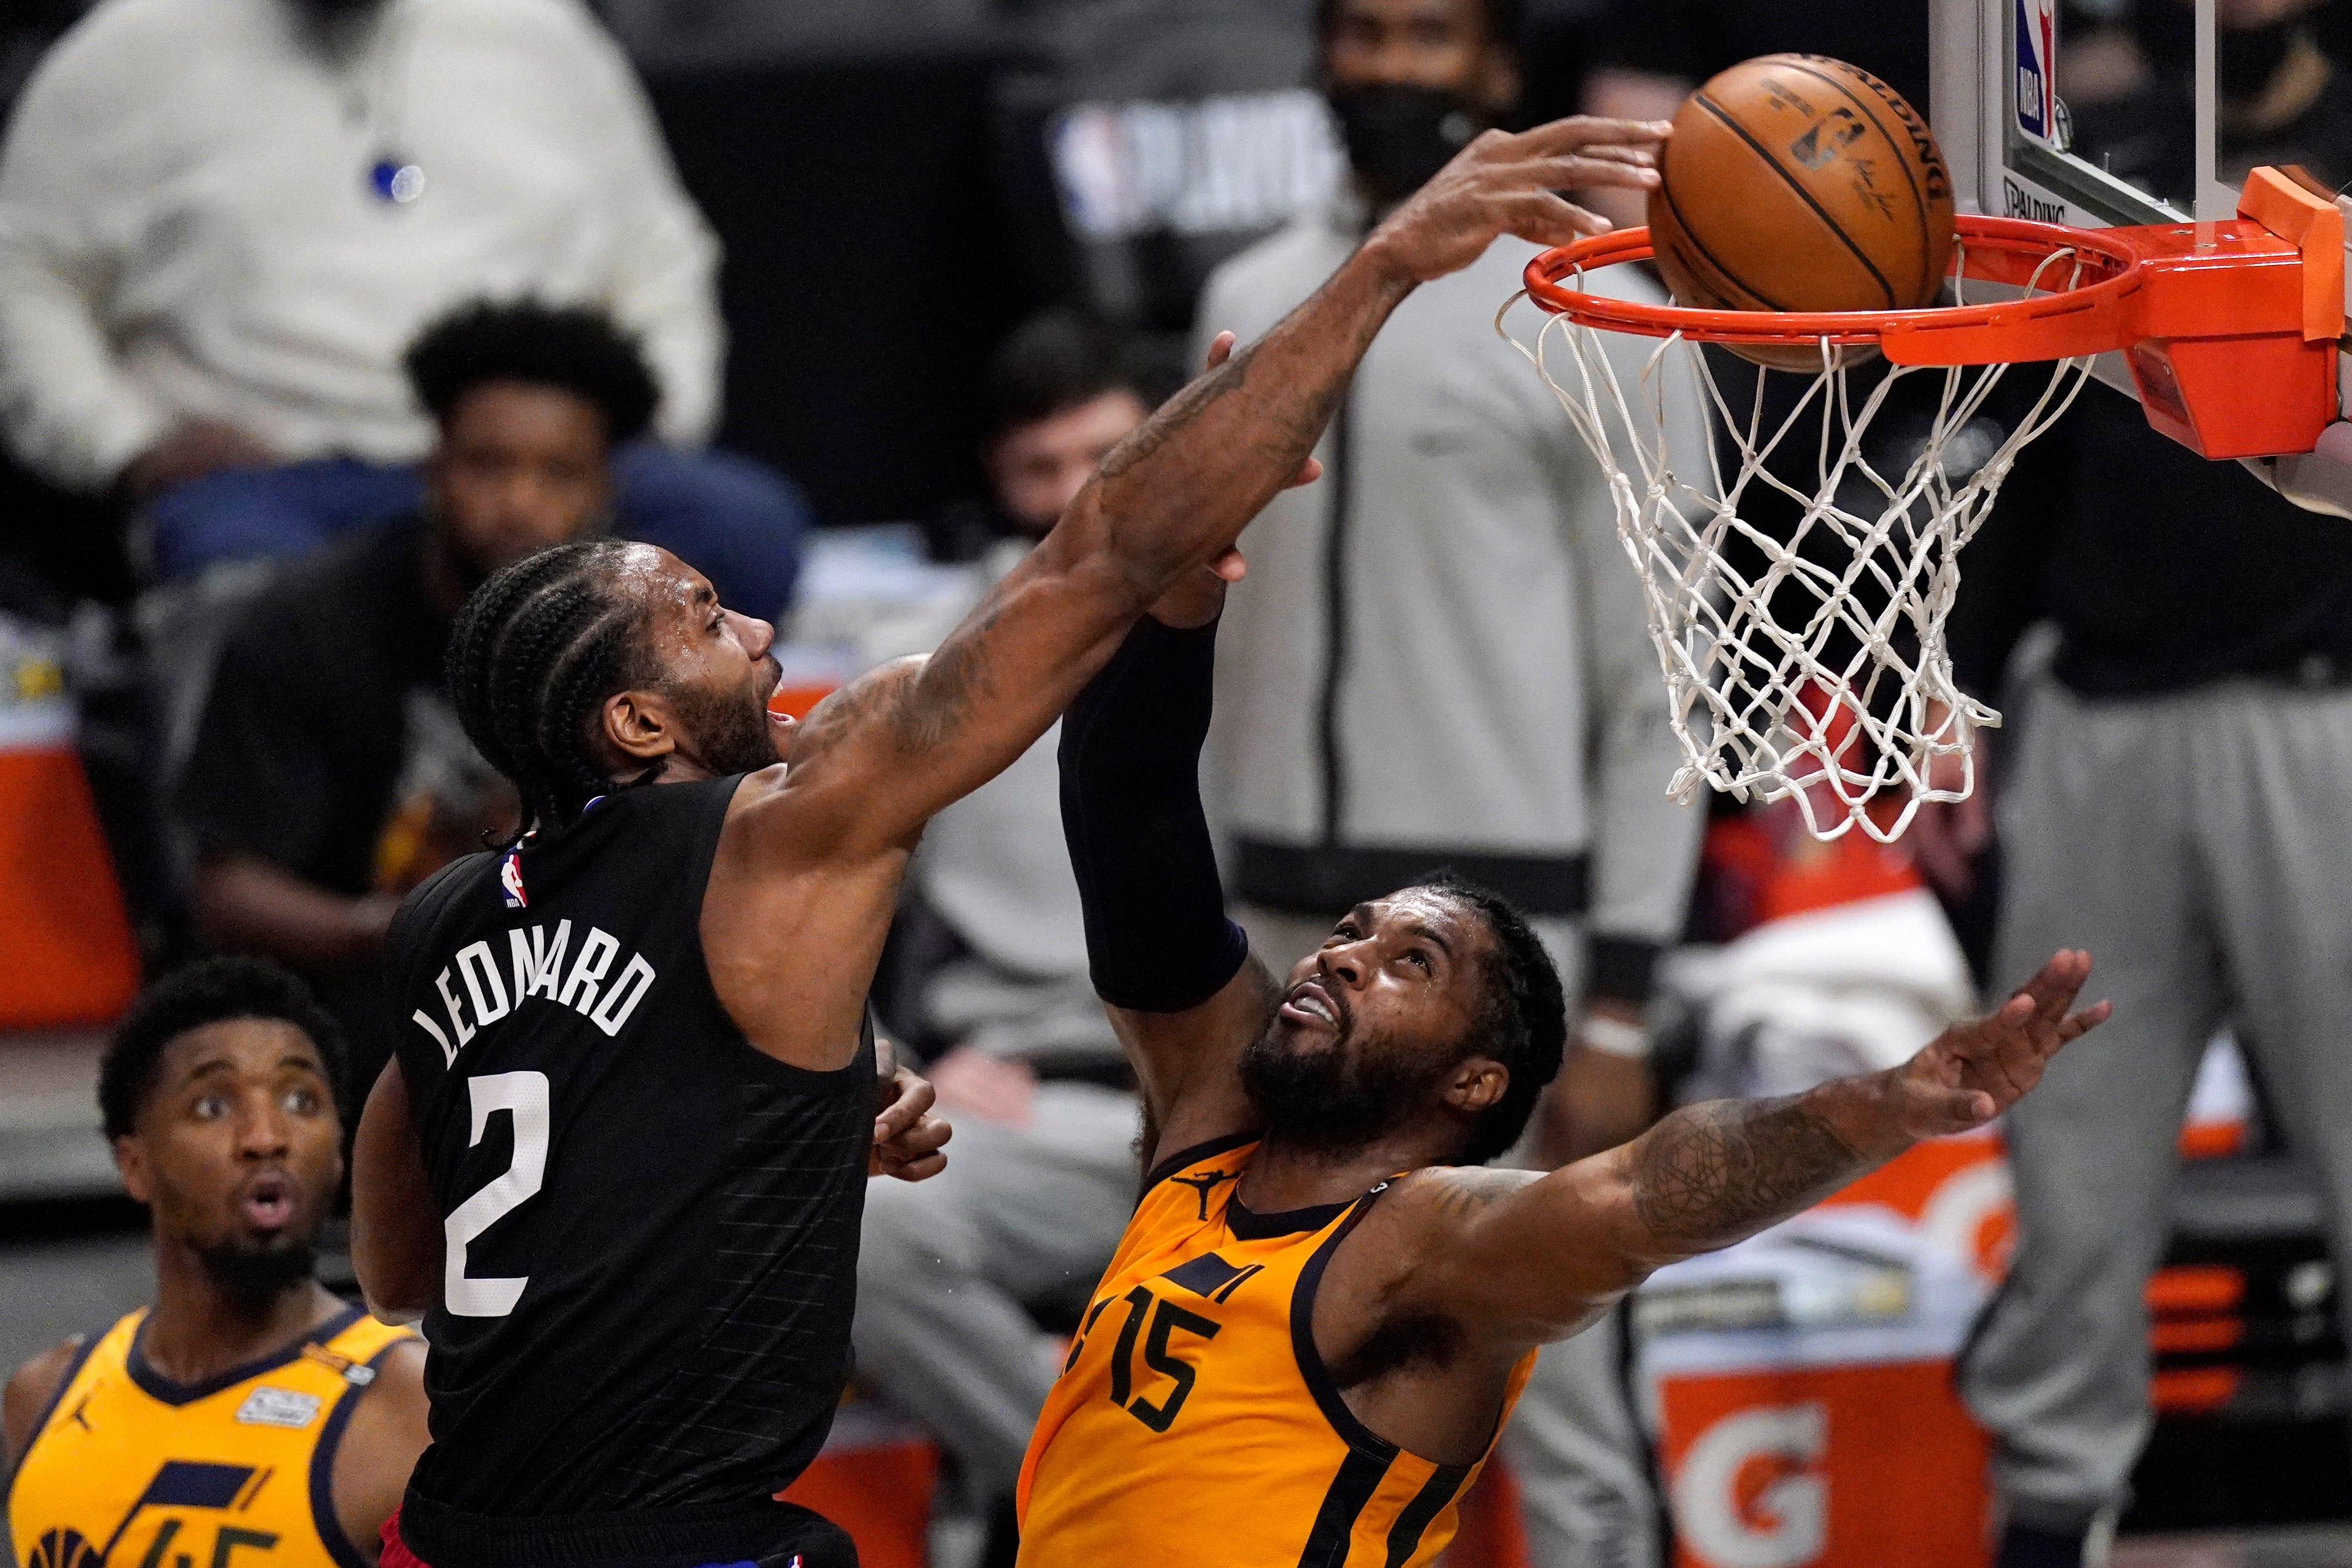 Kawhi Leonard's dunk captures Clippers' Game 4 dominance vs. Jazz